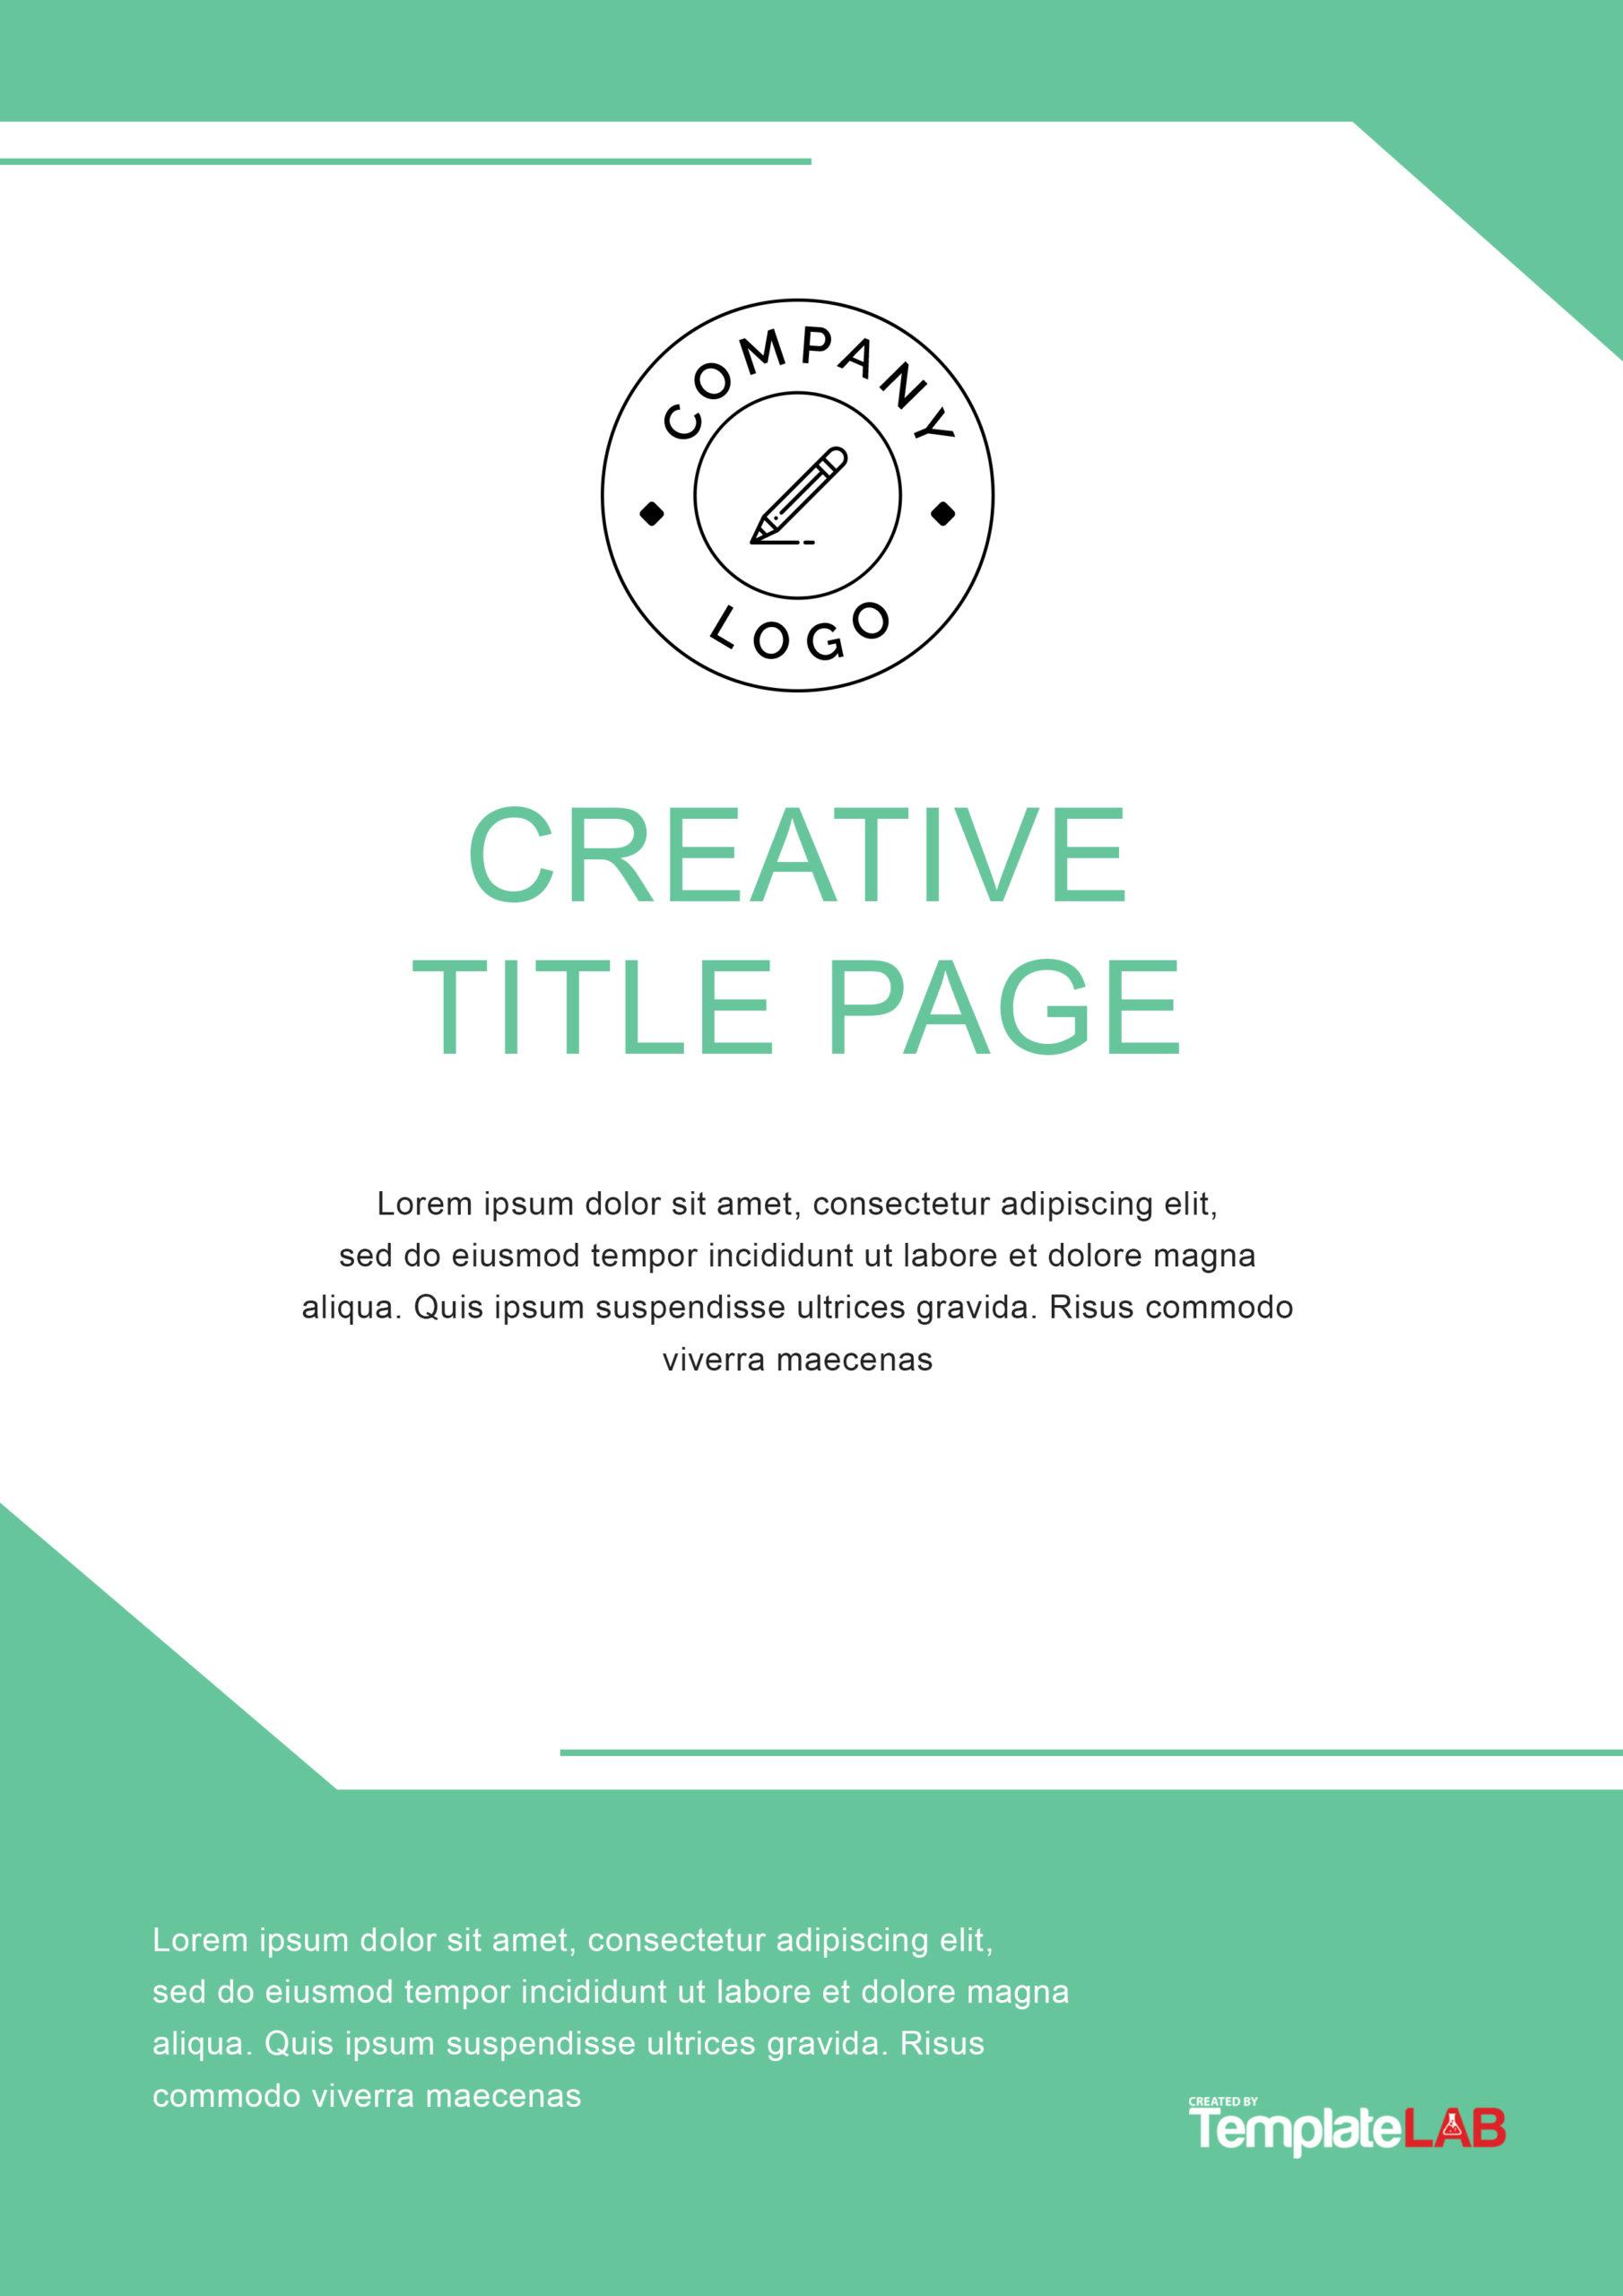 Free Creative title Page Template - TemplateLab.com